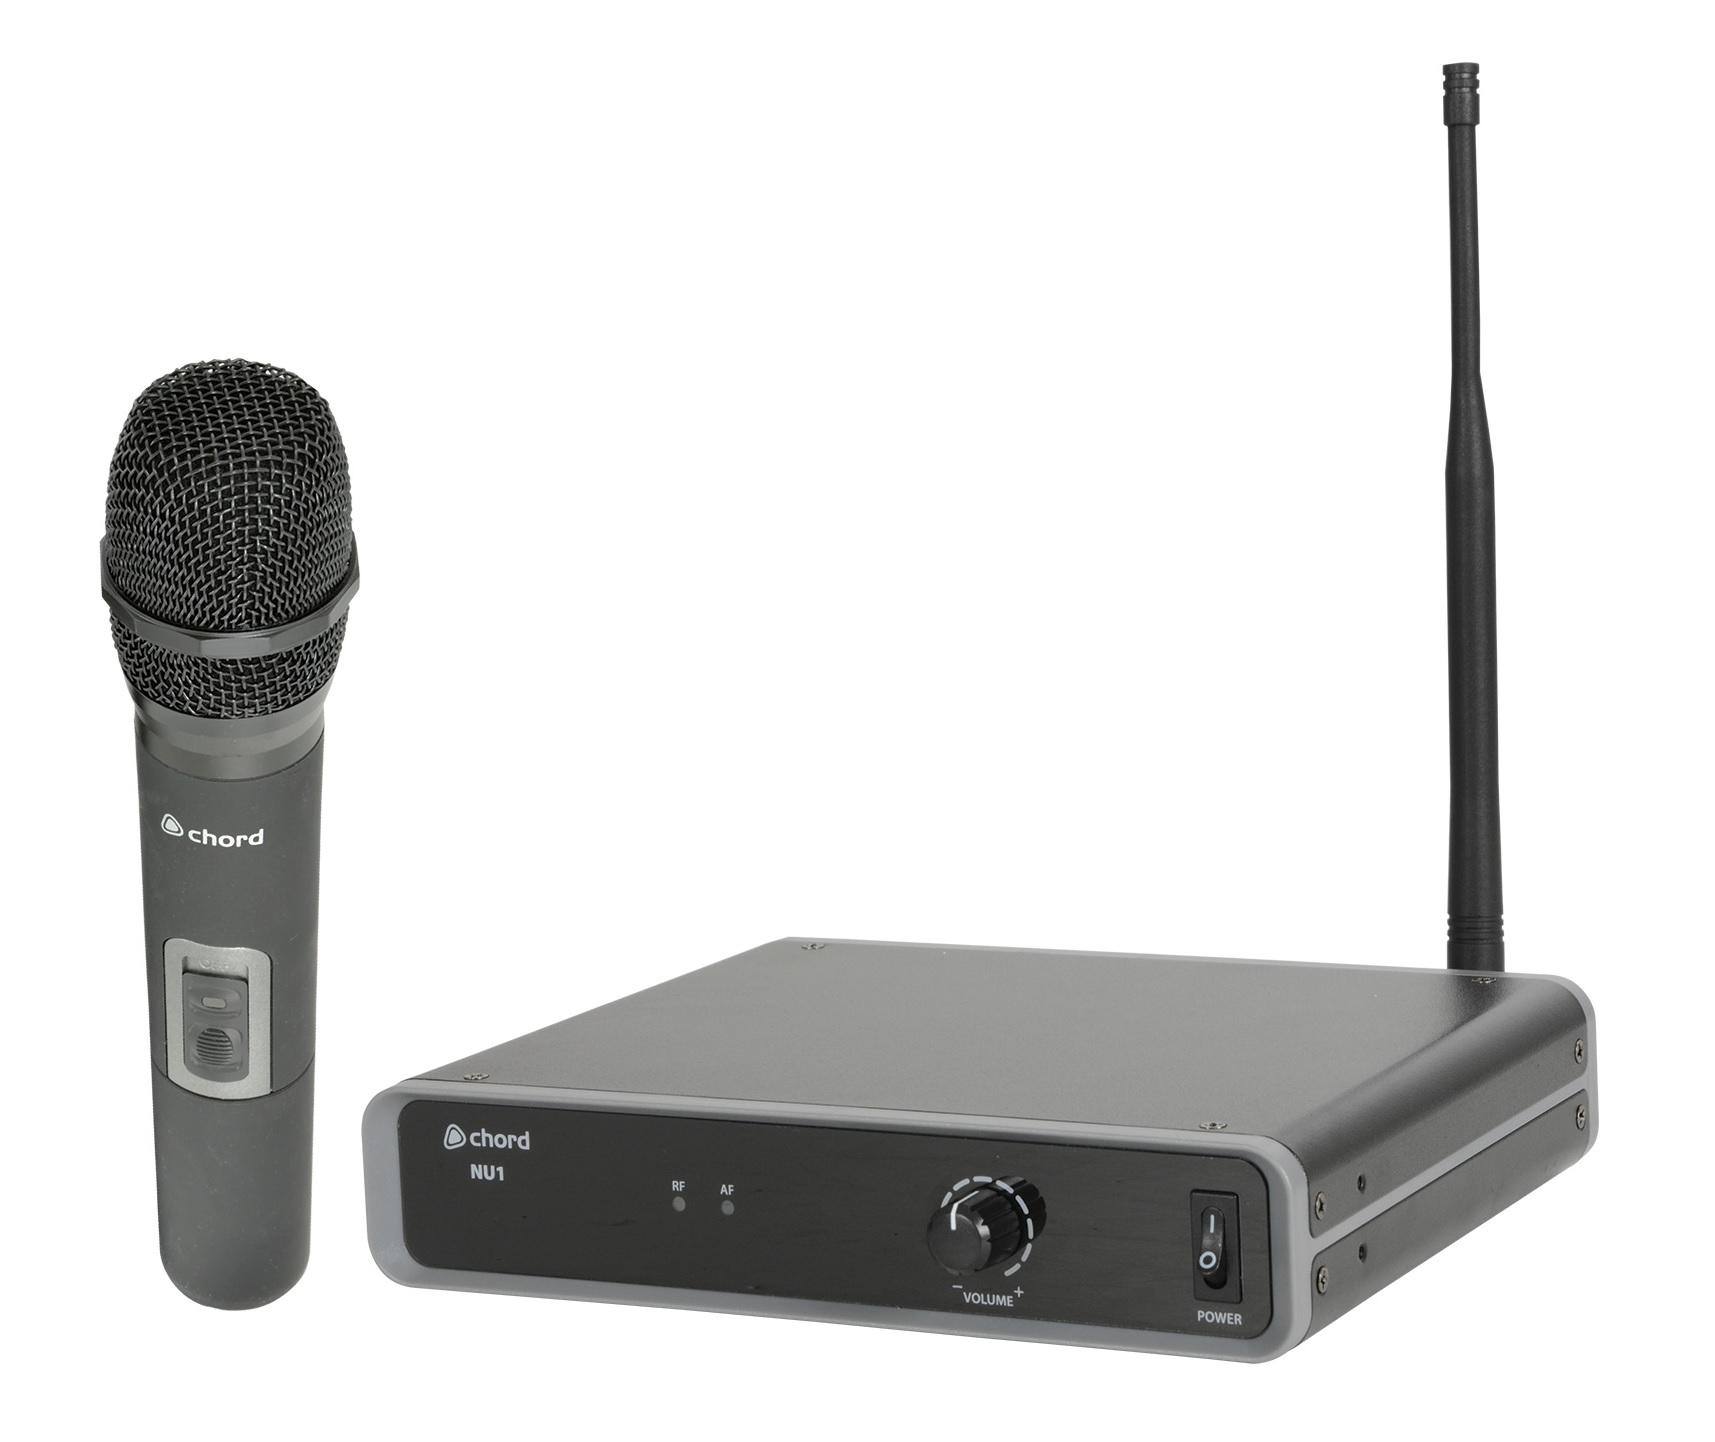 Chord NU1-H UHF Wireless Handheld Microphone 864.1mhz 171.982UK